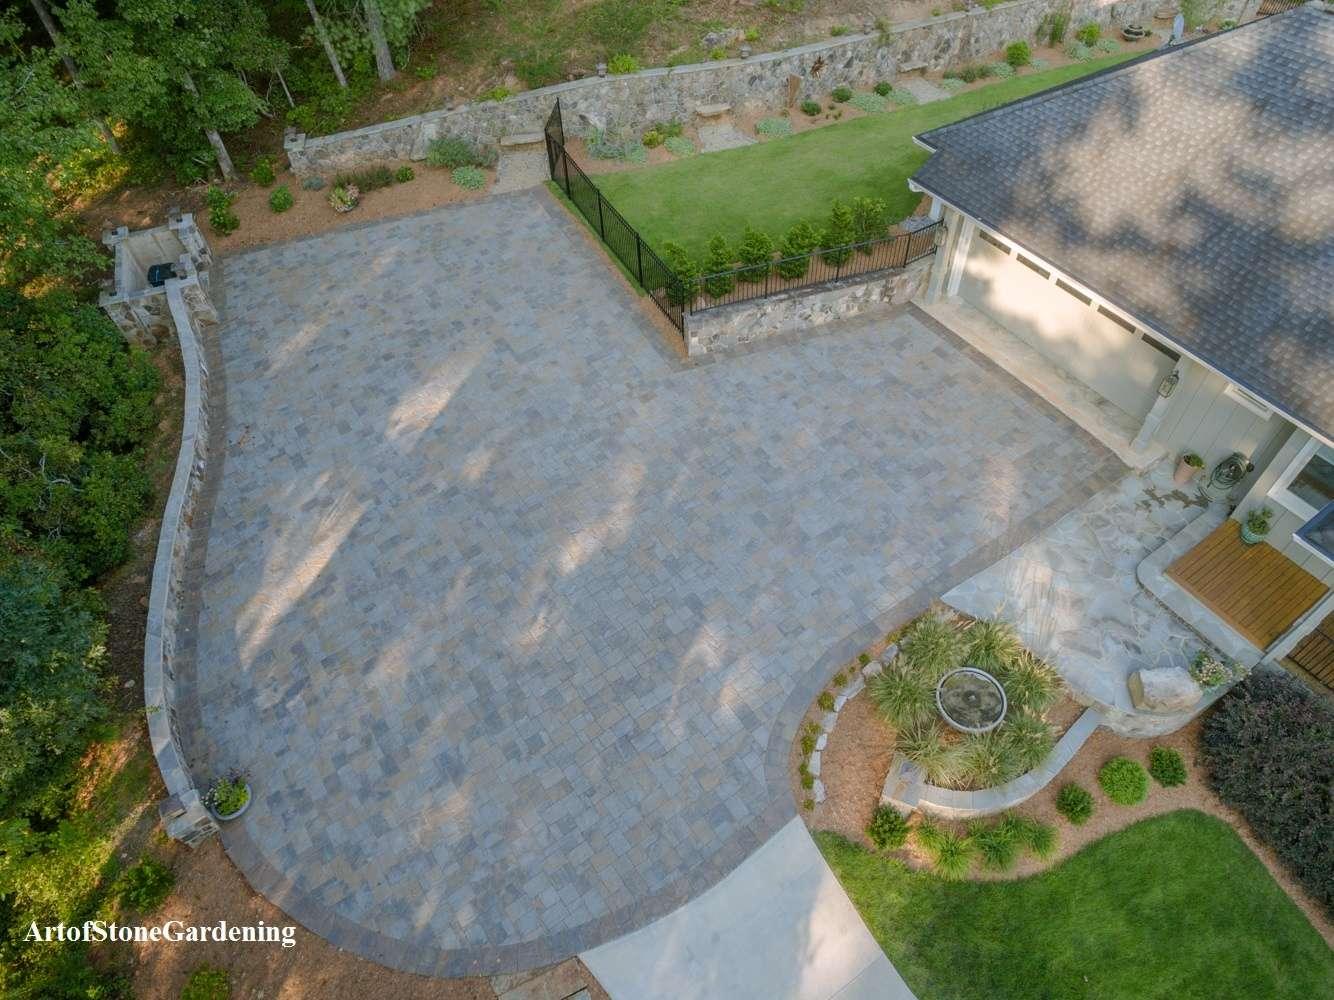 Belgard paver driveway and stone walls